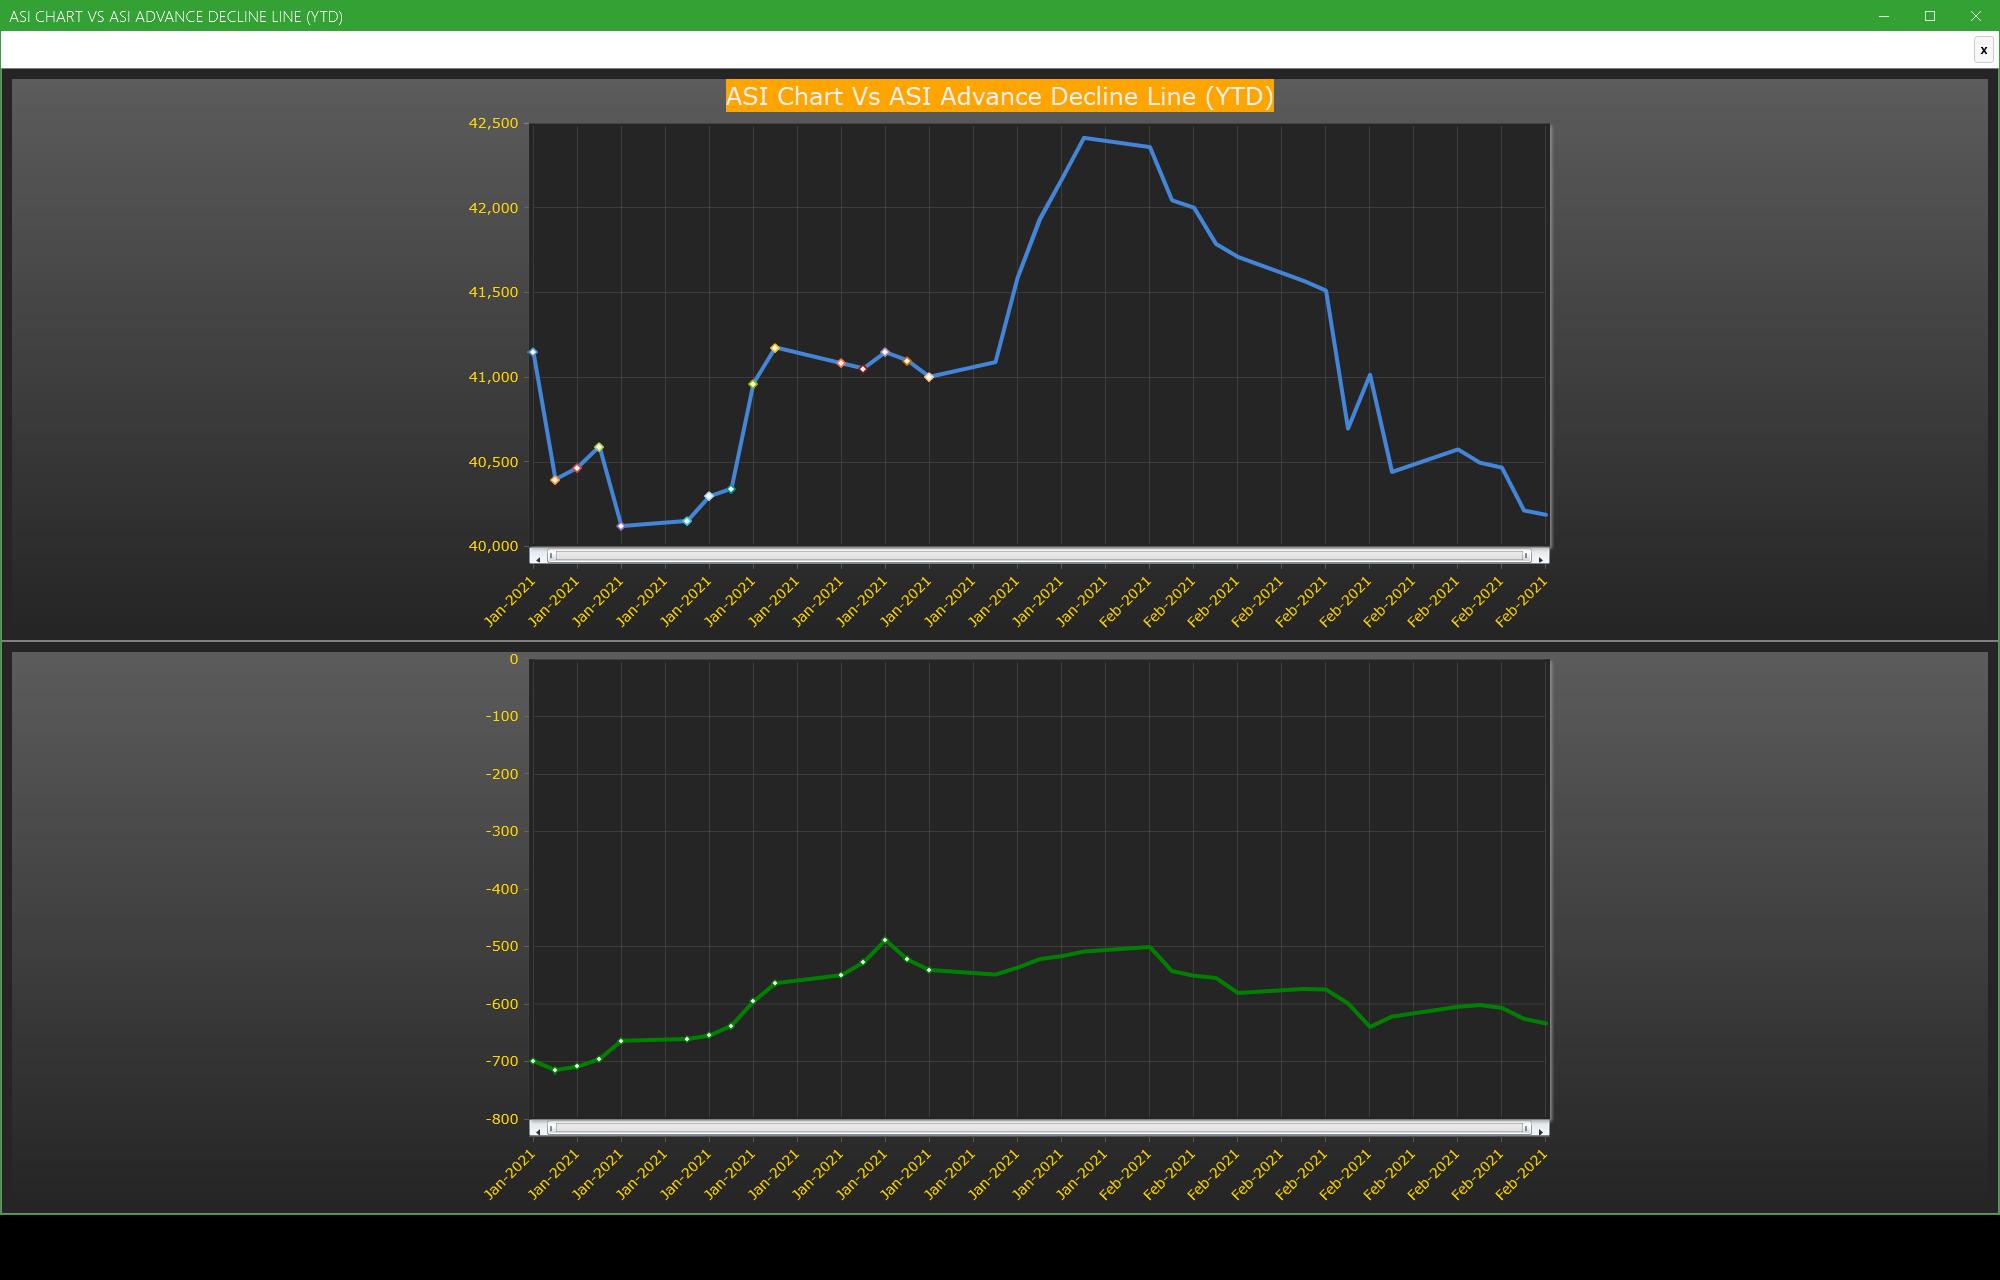 ASI Chart Vs ASI Advance Decline Line (YTD) - Market breath